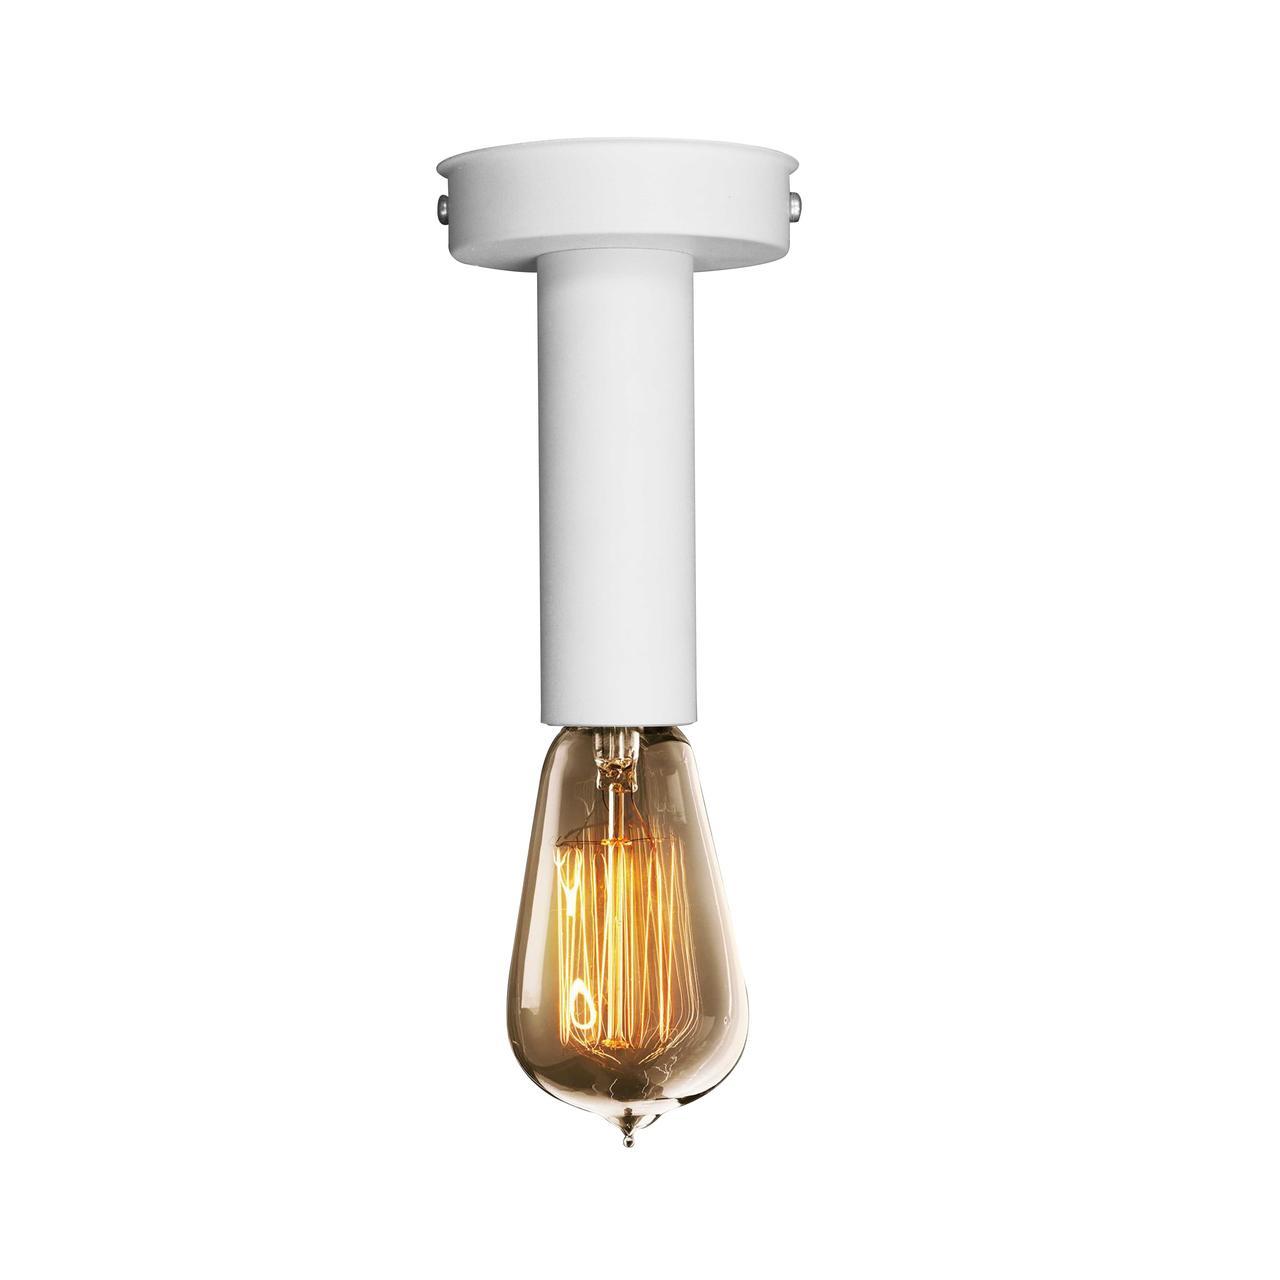 Светильник потолочный  NL 1409 W MSK Electric white